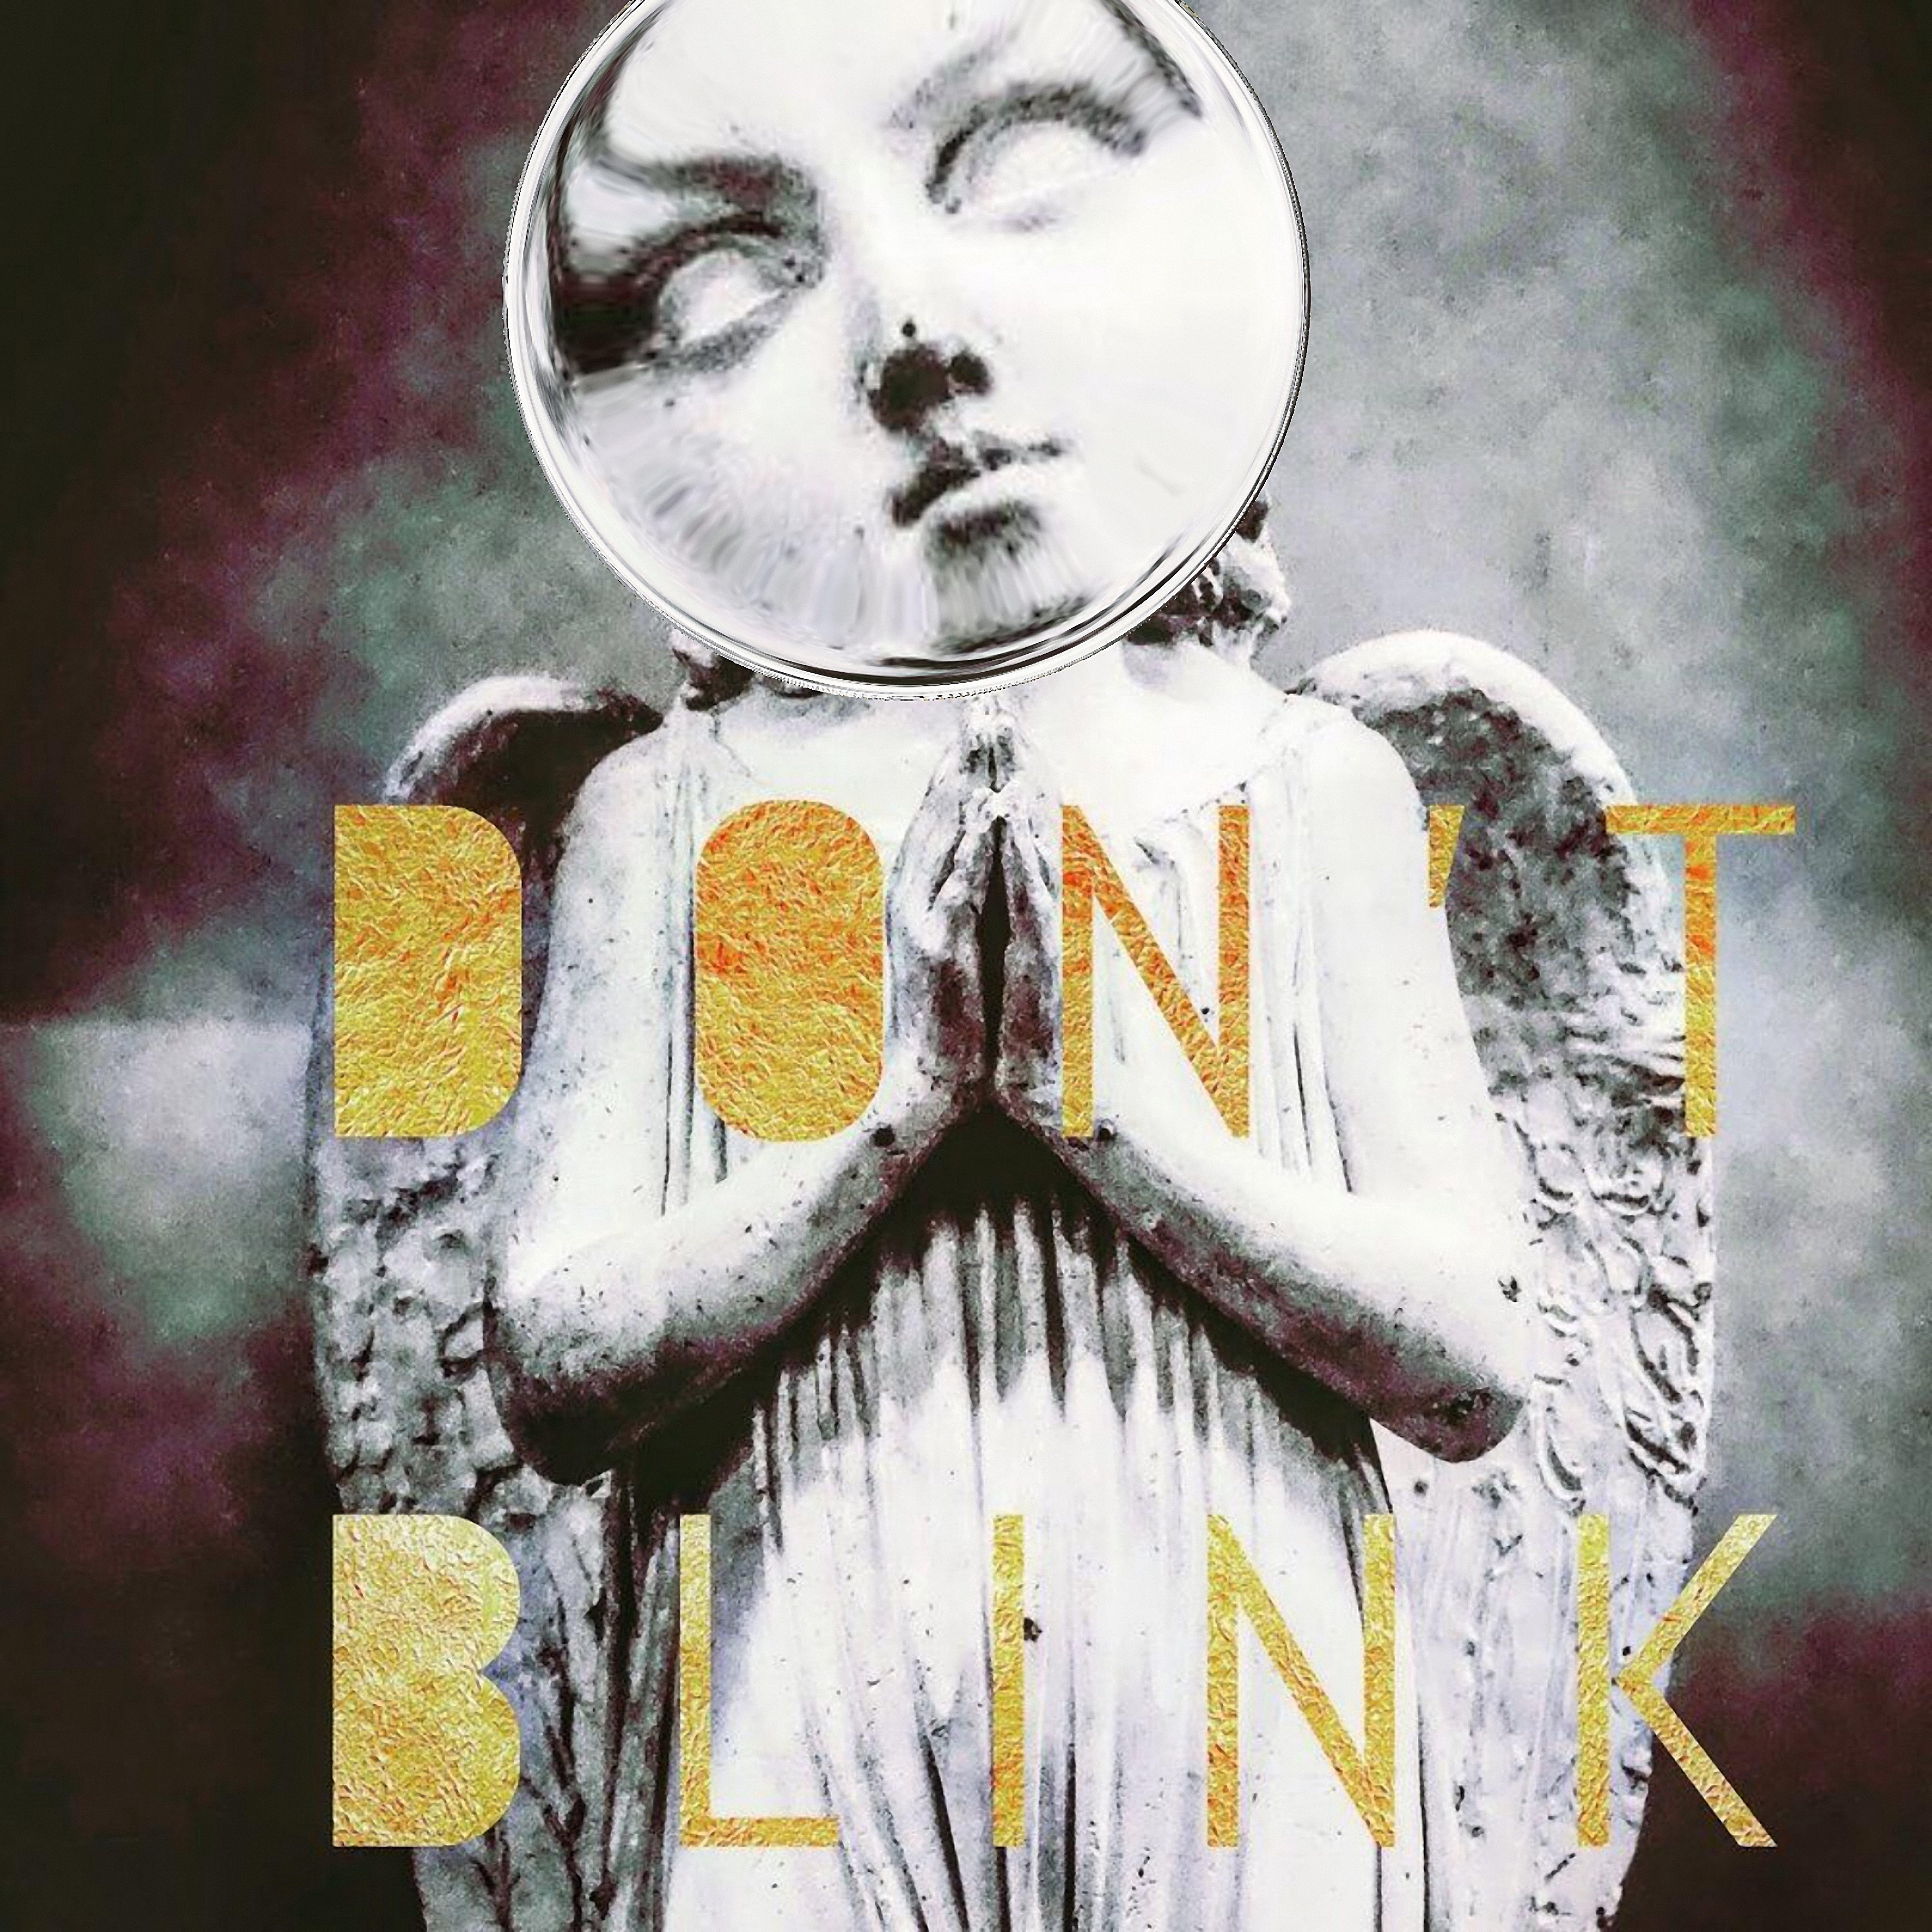 dont-blink-dr-who-statue.jpg